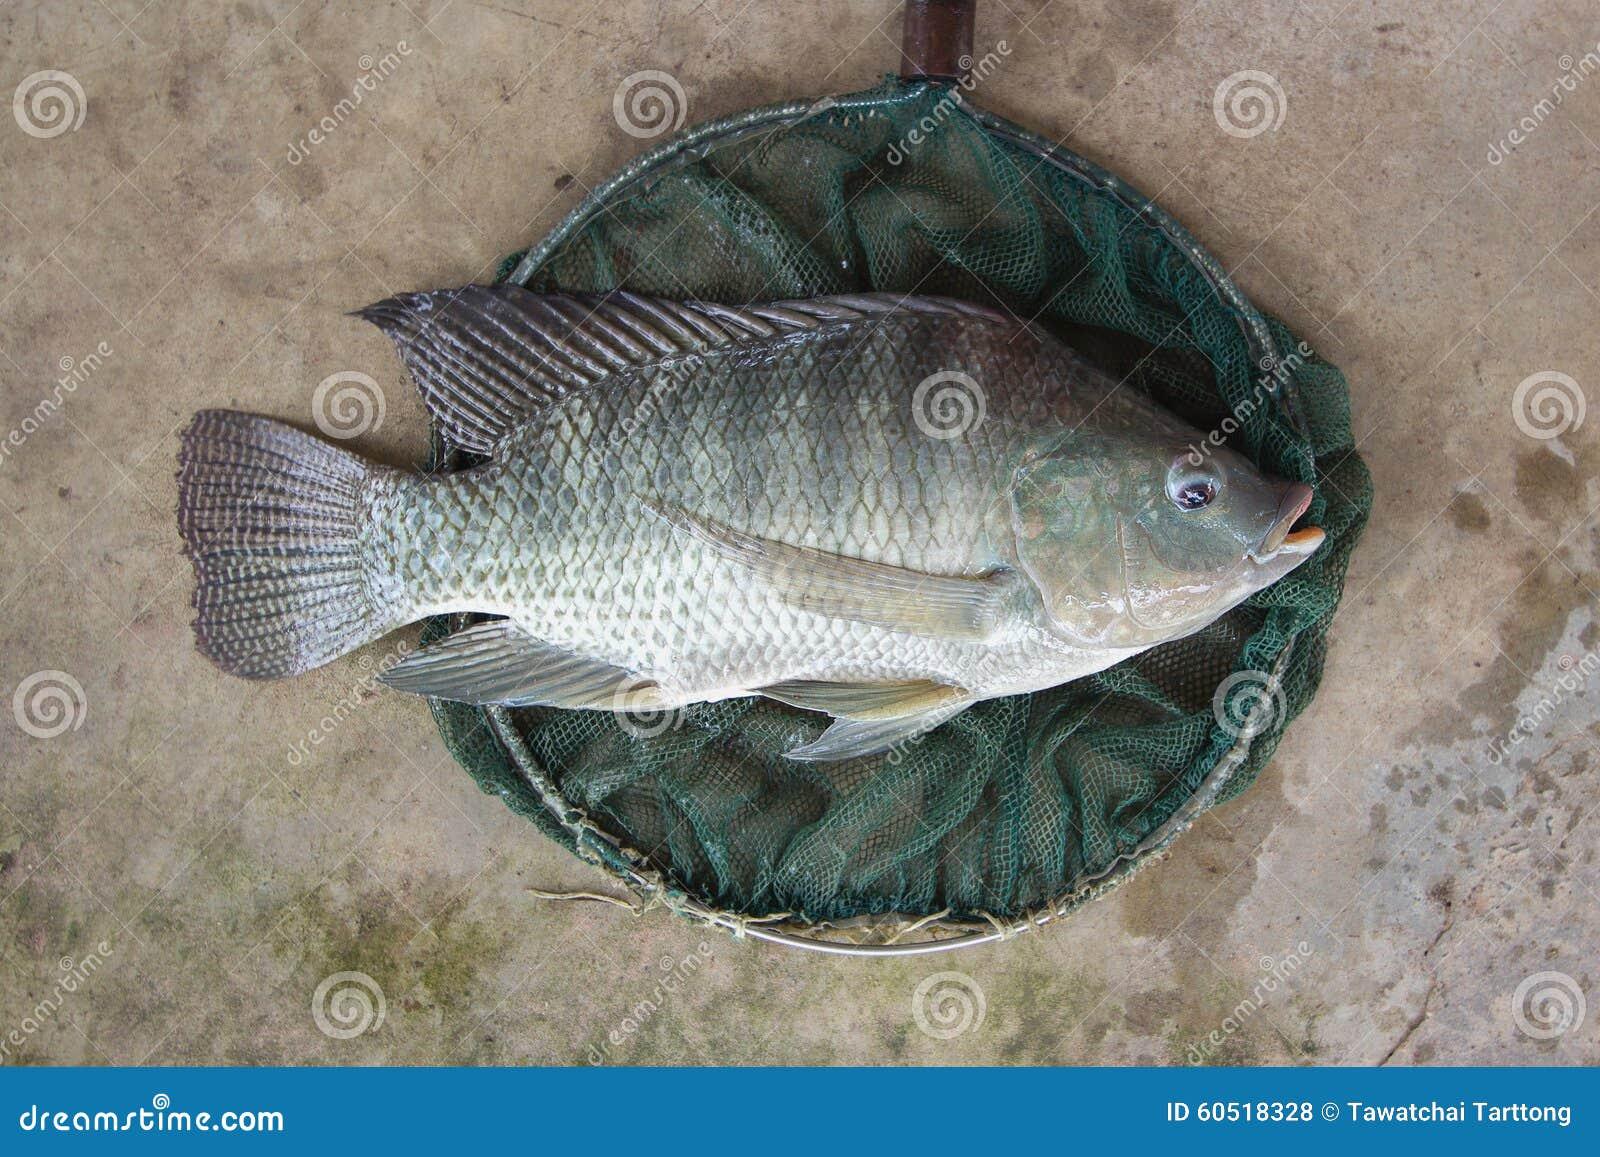 Tilapia oreochromis niloticus big size in fishing net for Fishing for tilapia